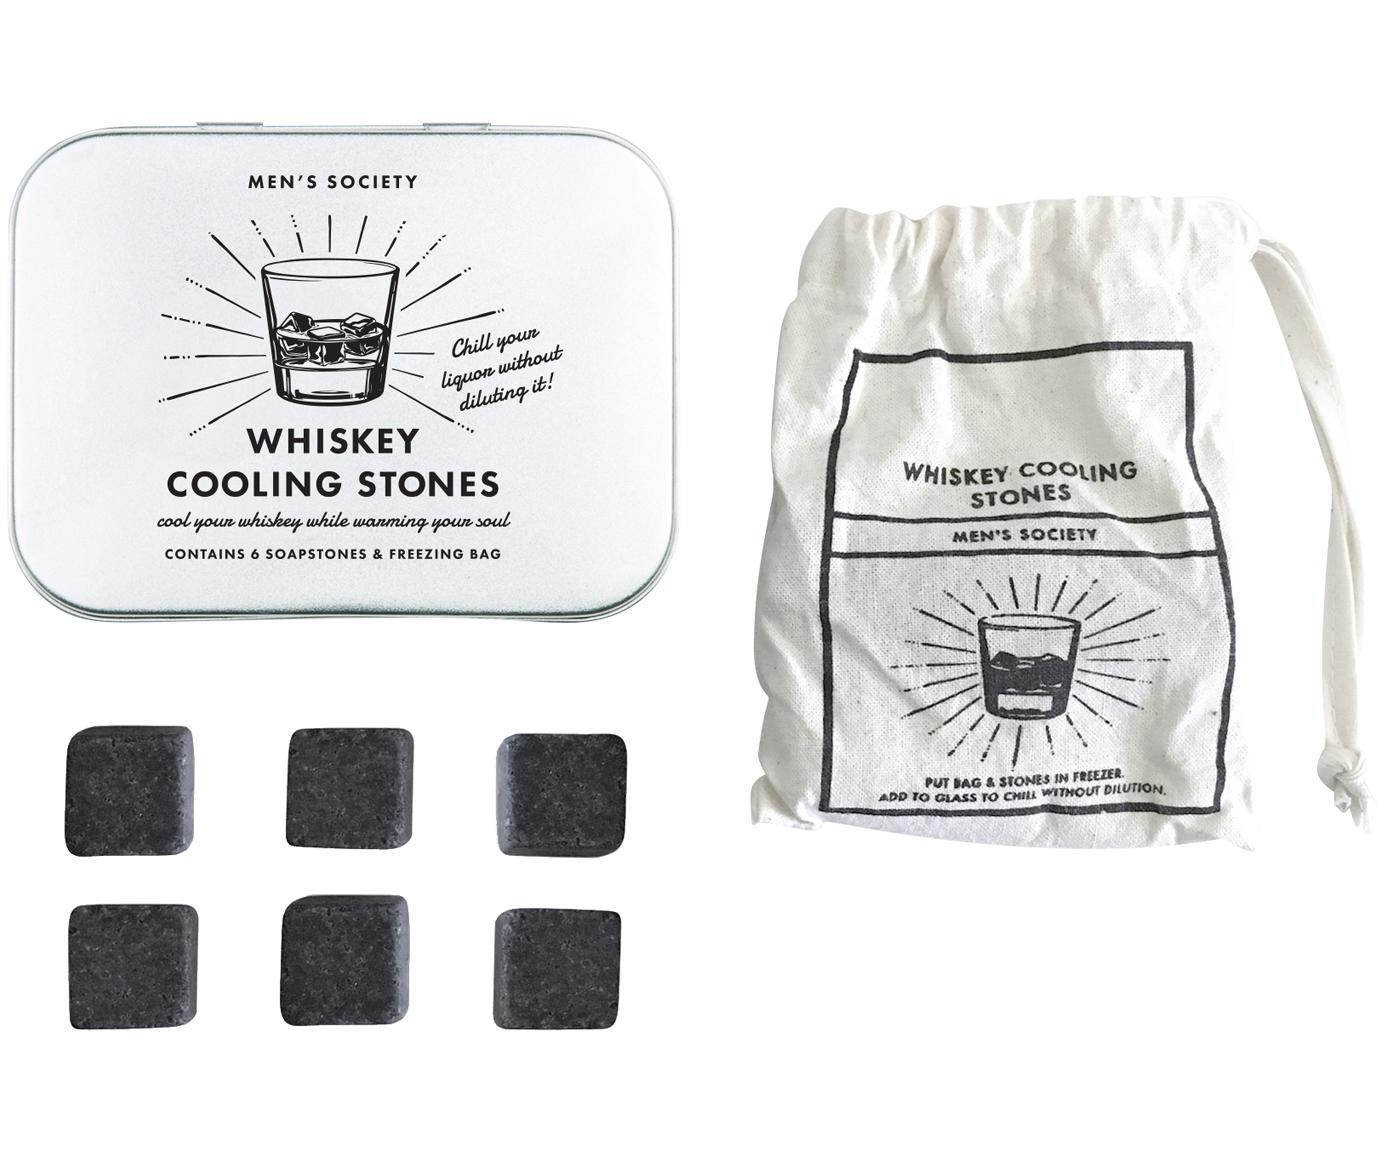 Set piedras de Whiskey, 7pzas., Bolsa: algodón, Caja: metal, Gris, Tamaños diferentes